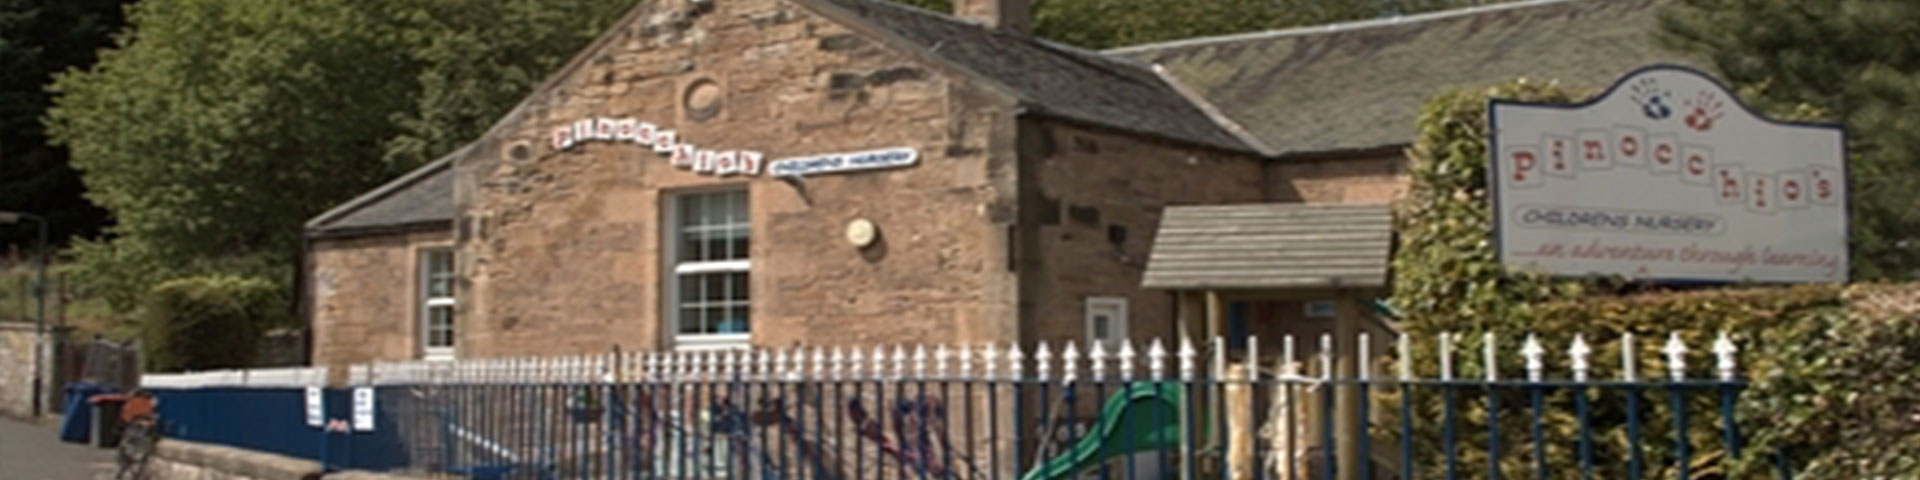 Lasswade Day Nursery, Midlothian